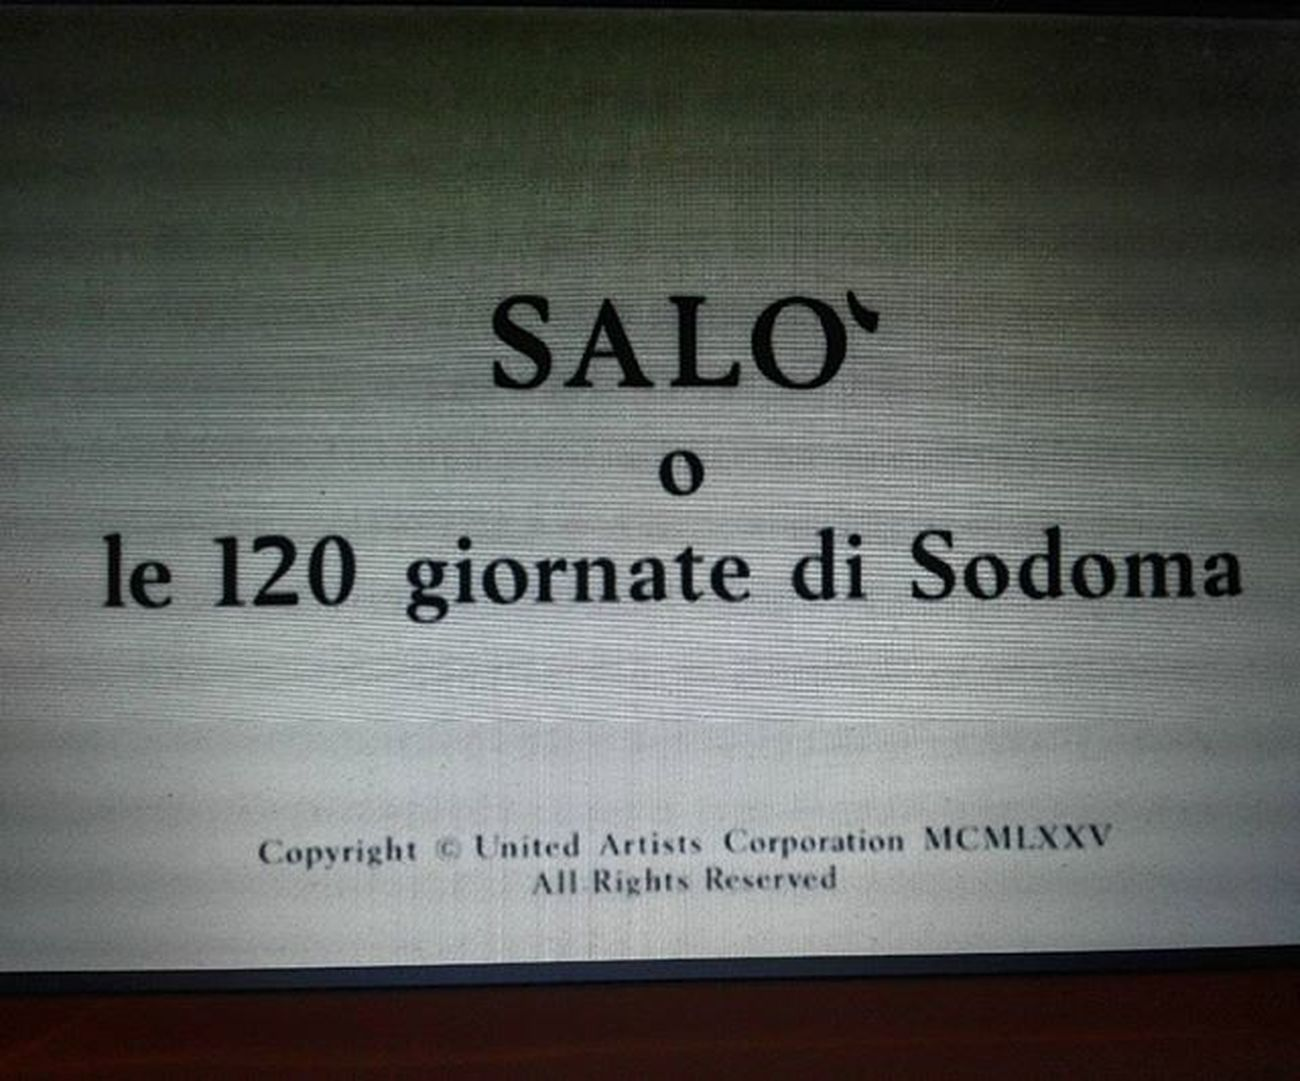 kis esti olasz klasszikusok... 😂😂👌 Film Home MOVIE Classic Salo Sodoma Pervert Italian Kult